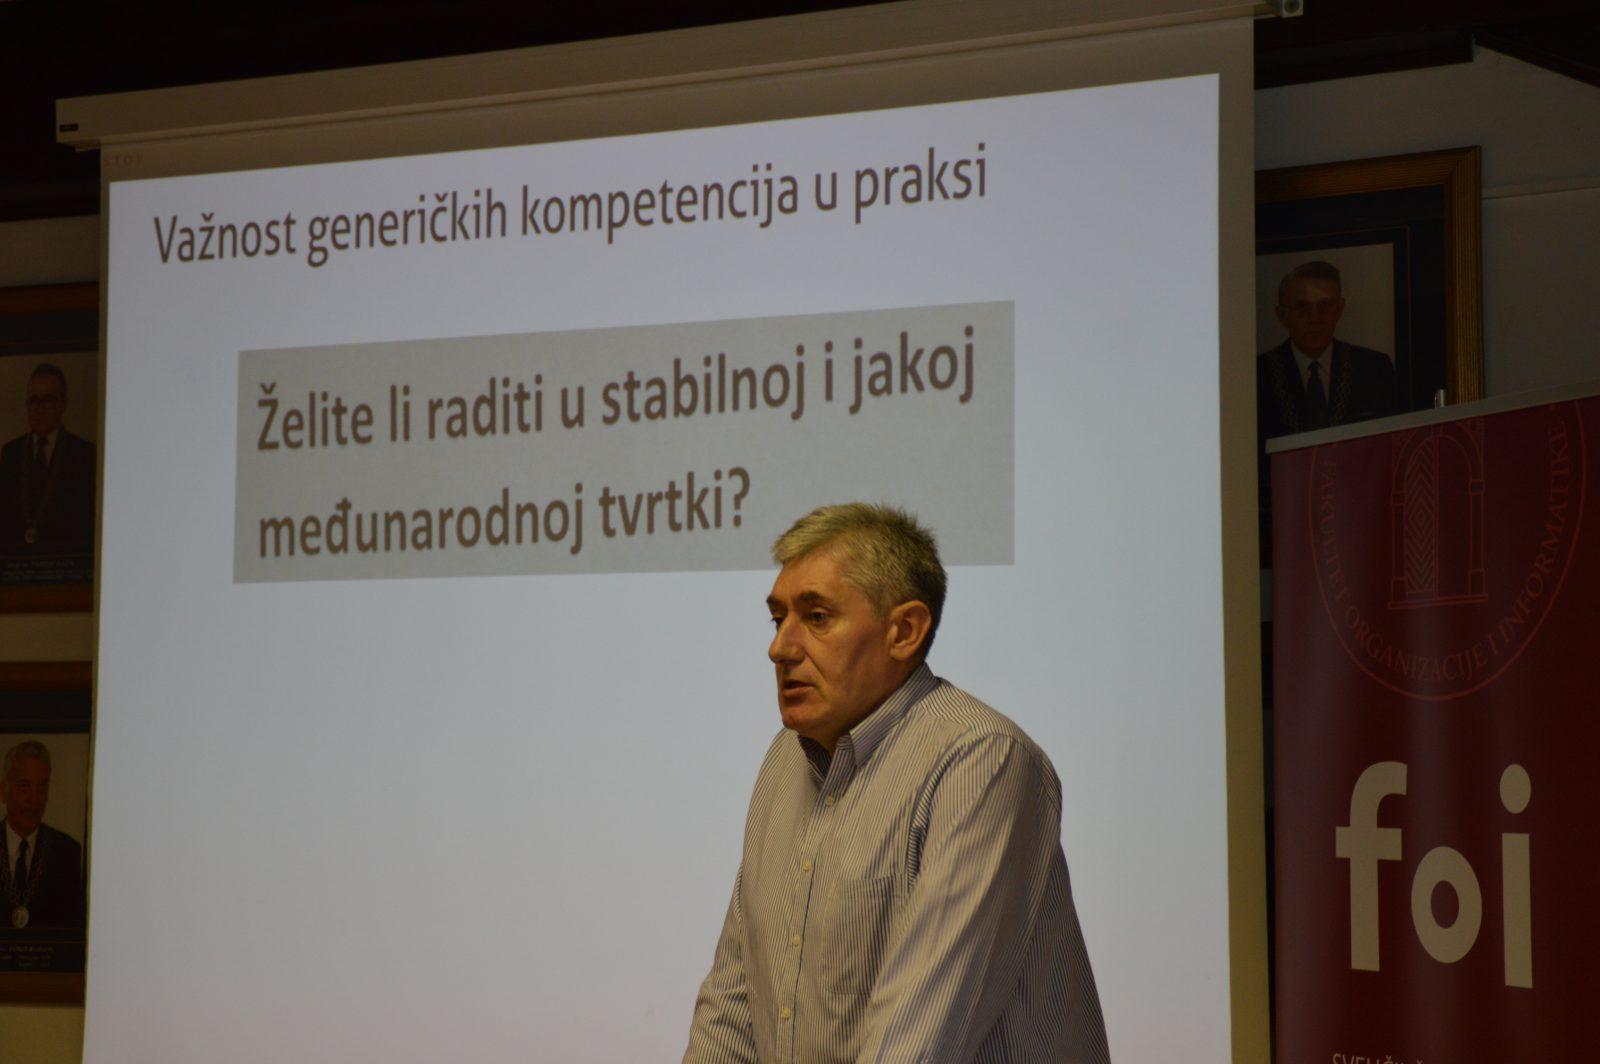 Vjeran Bušelić